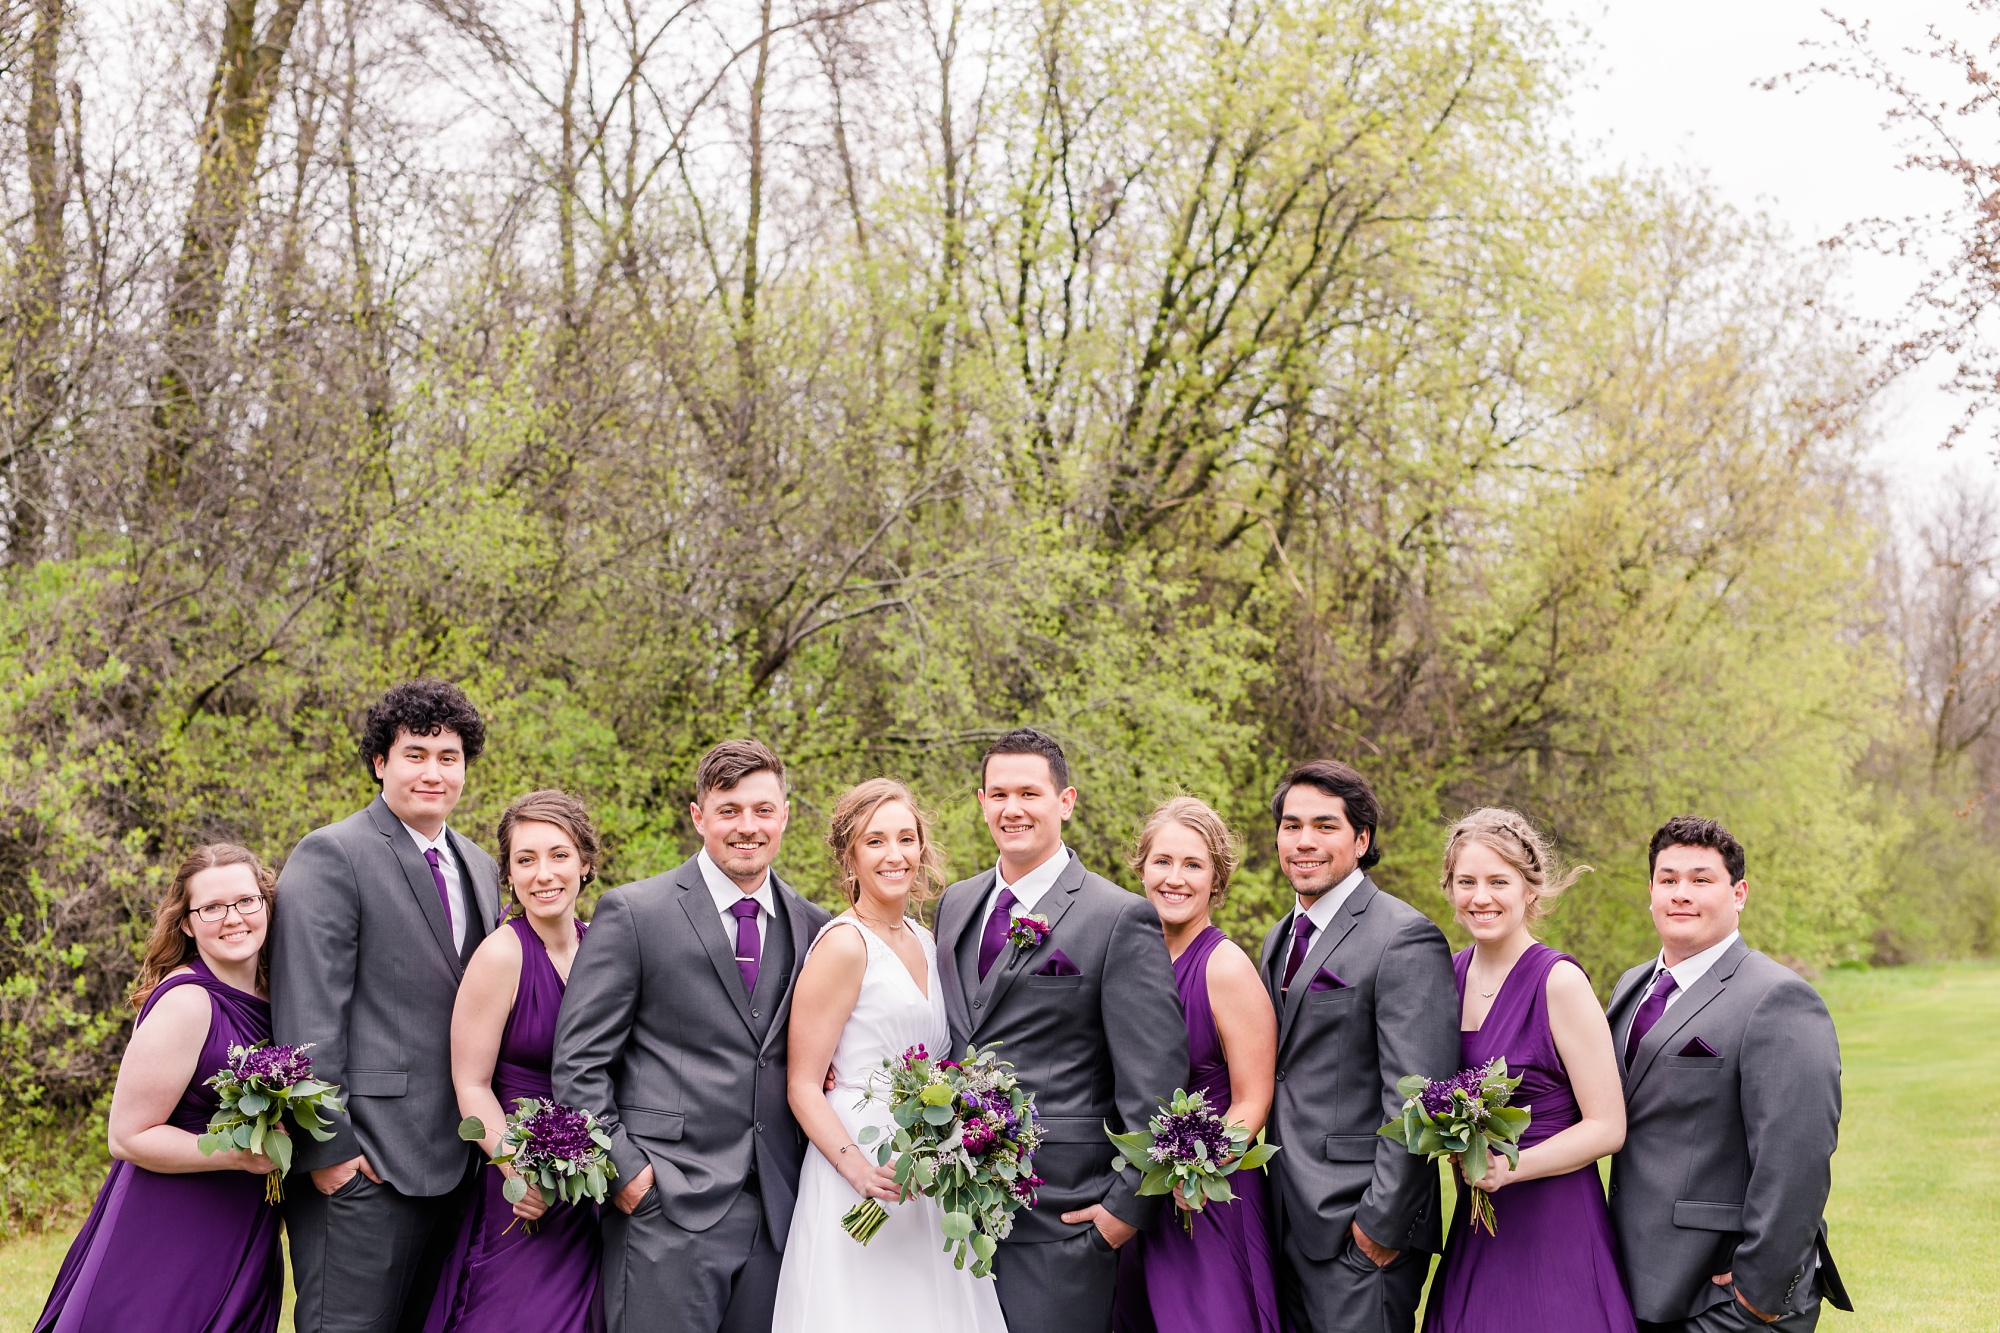 Amber Langerud Photography_Catholic Spring Wedding with Purple Accents_6318.jpg